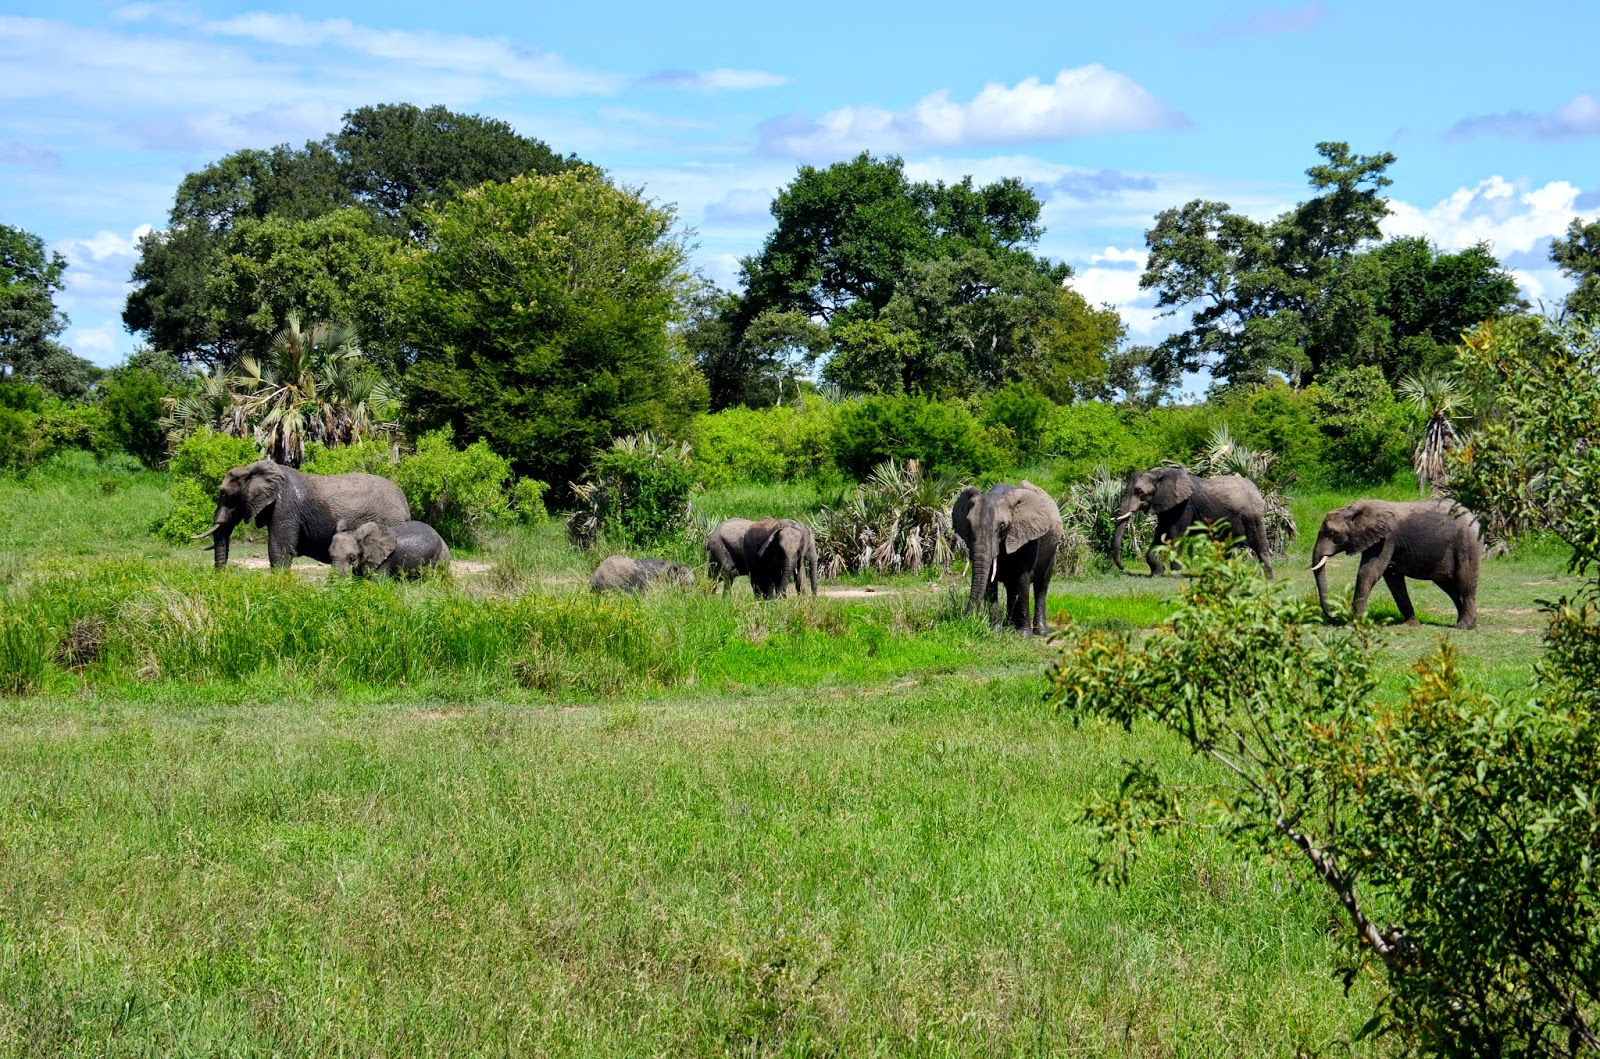 elephant family in kruger national park